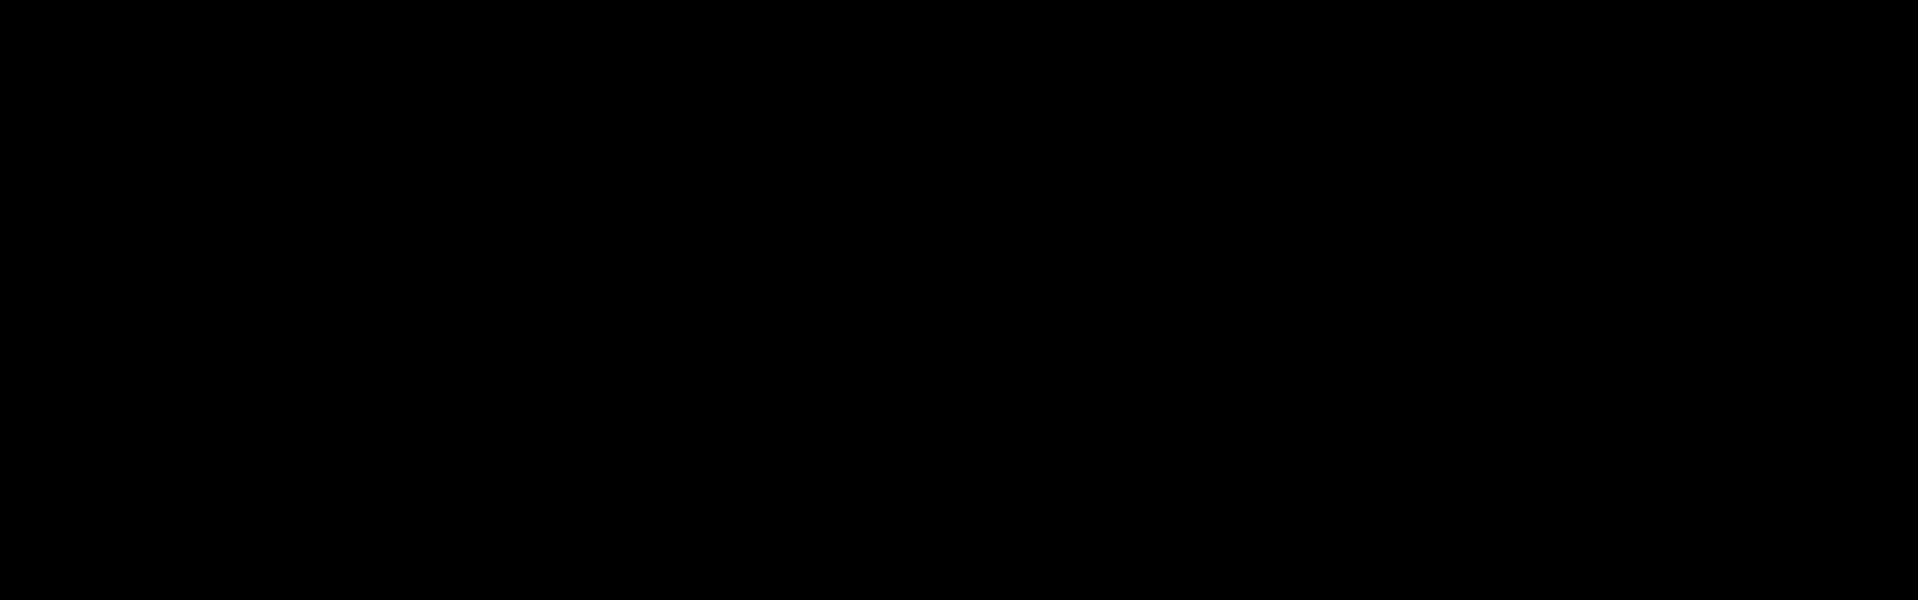 Idoko